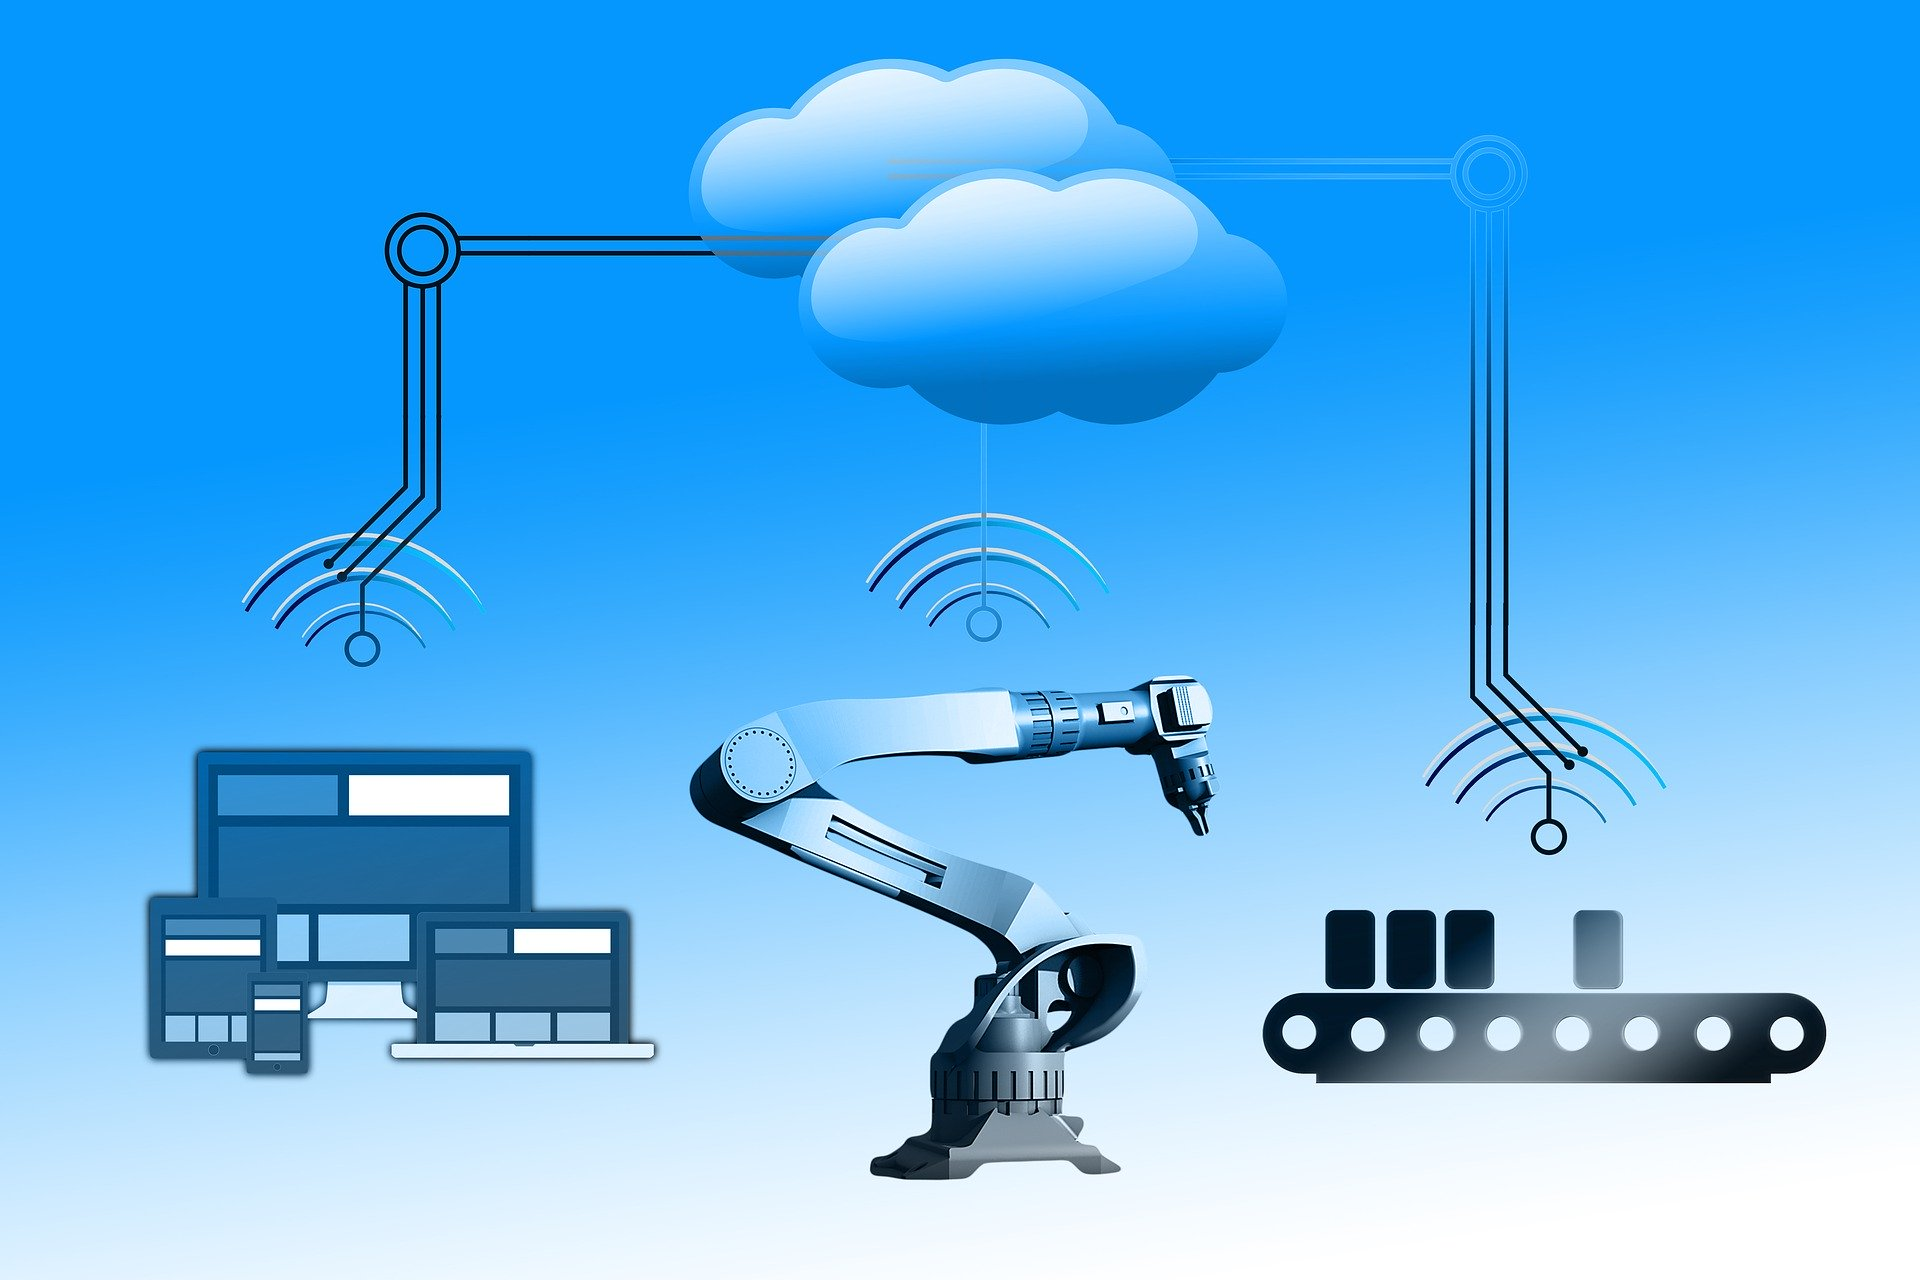 Image showing smart technology